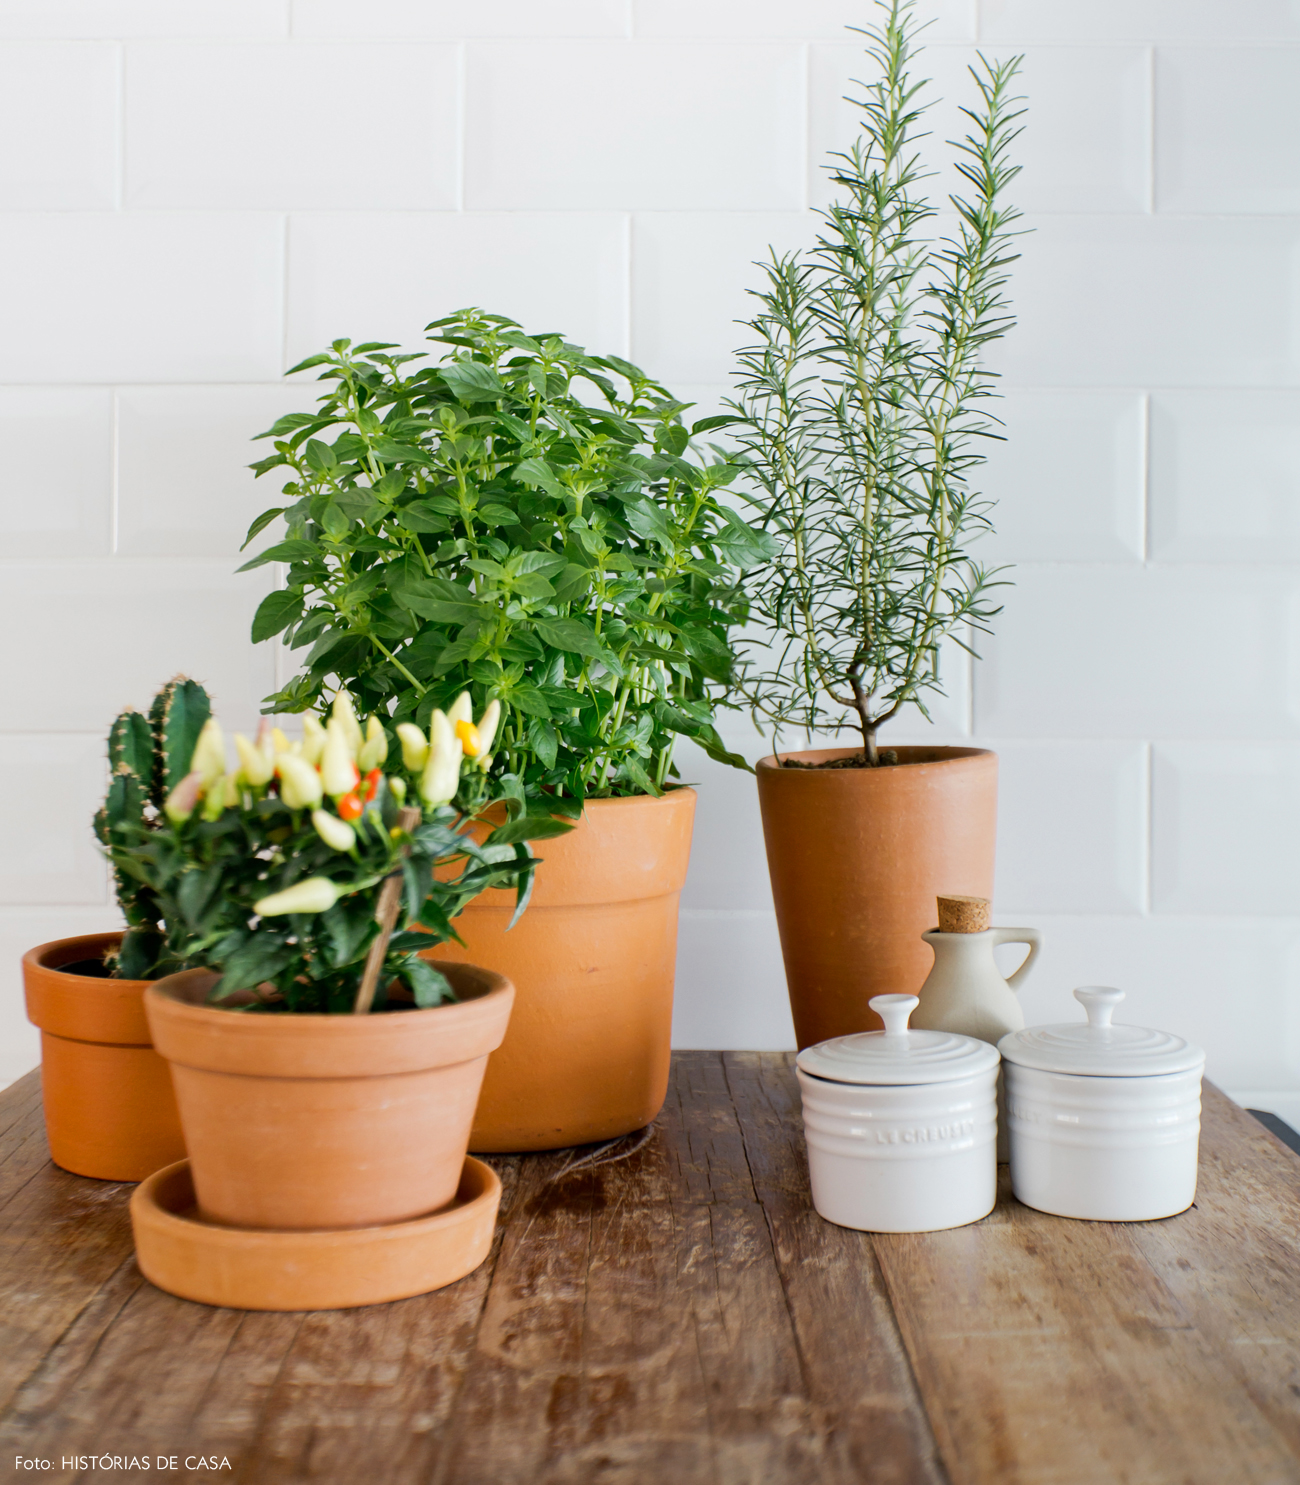 27-decoracao-cozinha-horta-caseira-no-apartamento-vaso-barro